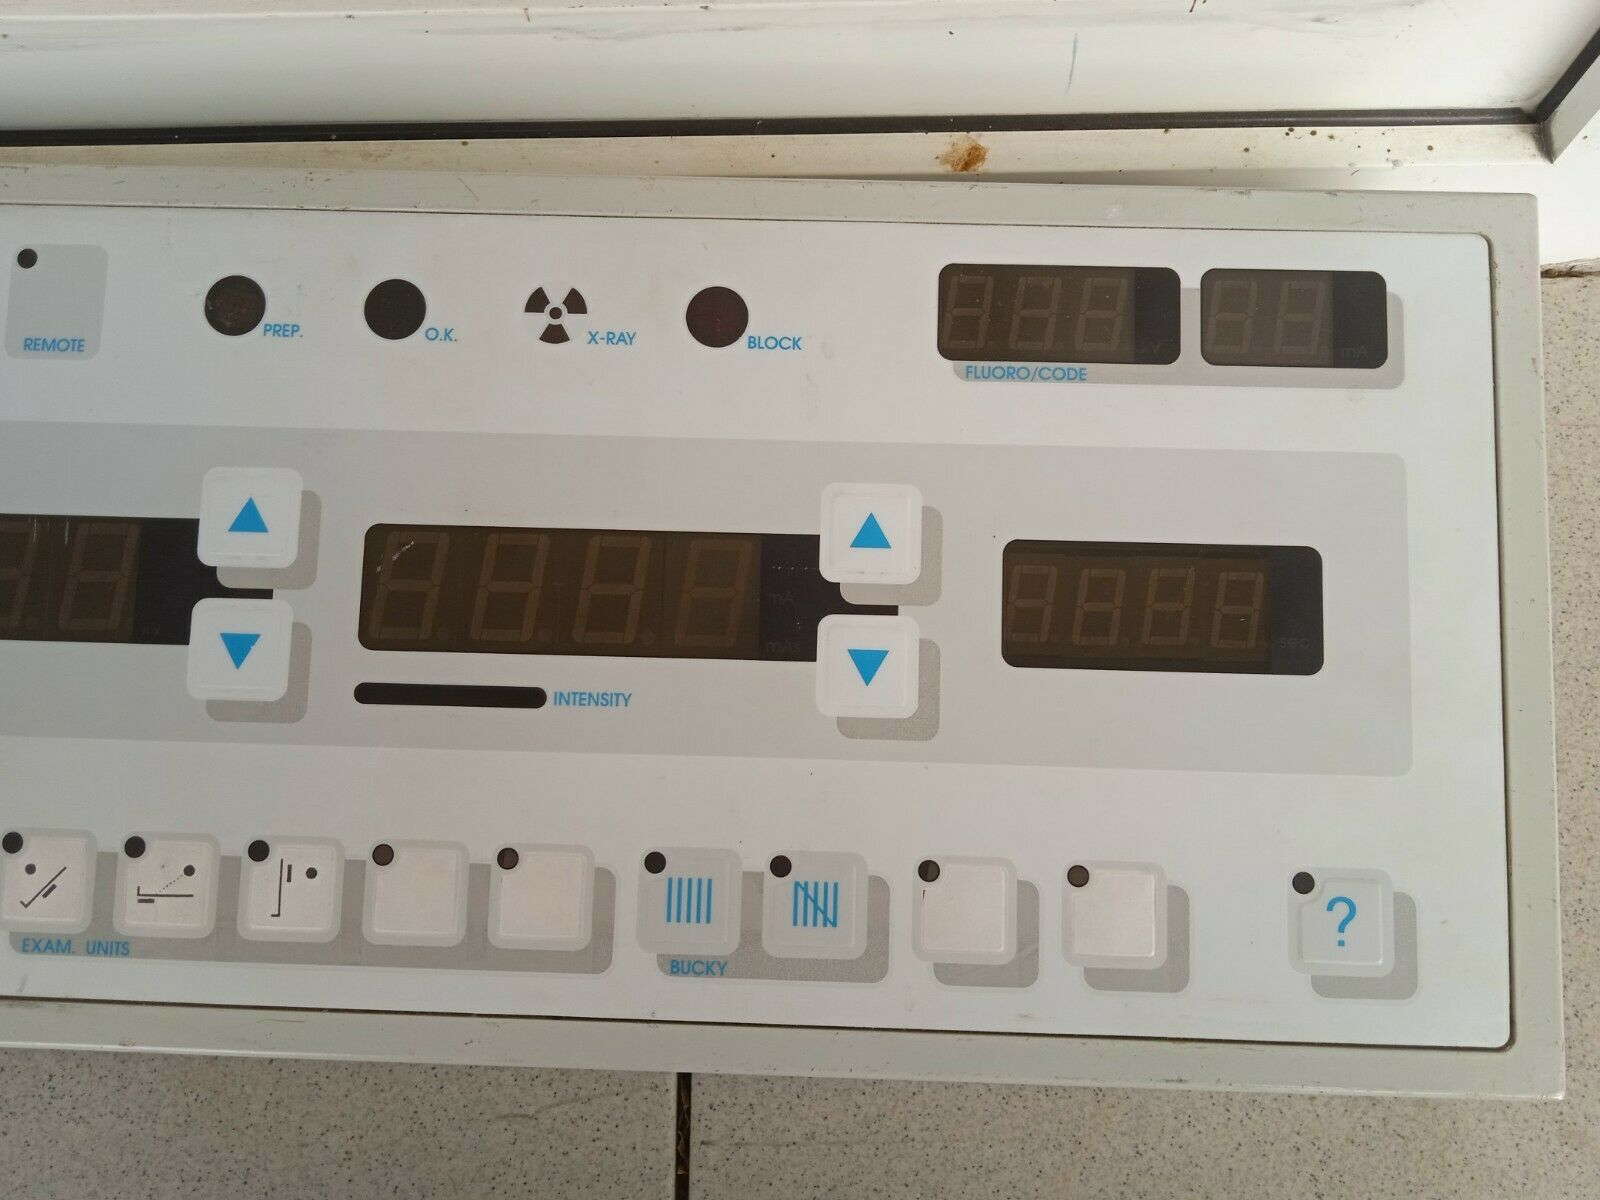 USED X-RAY RADIOLOGY  HOSPITAL MACHINE  KEYBOARD